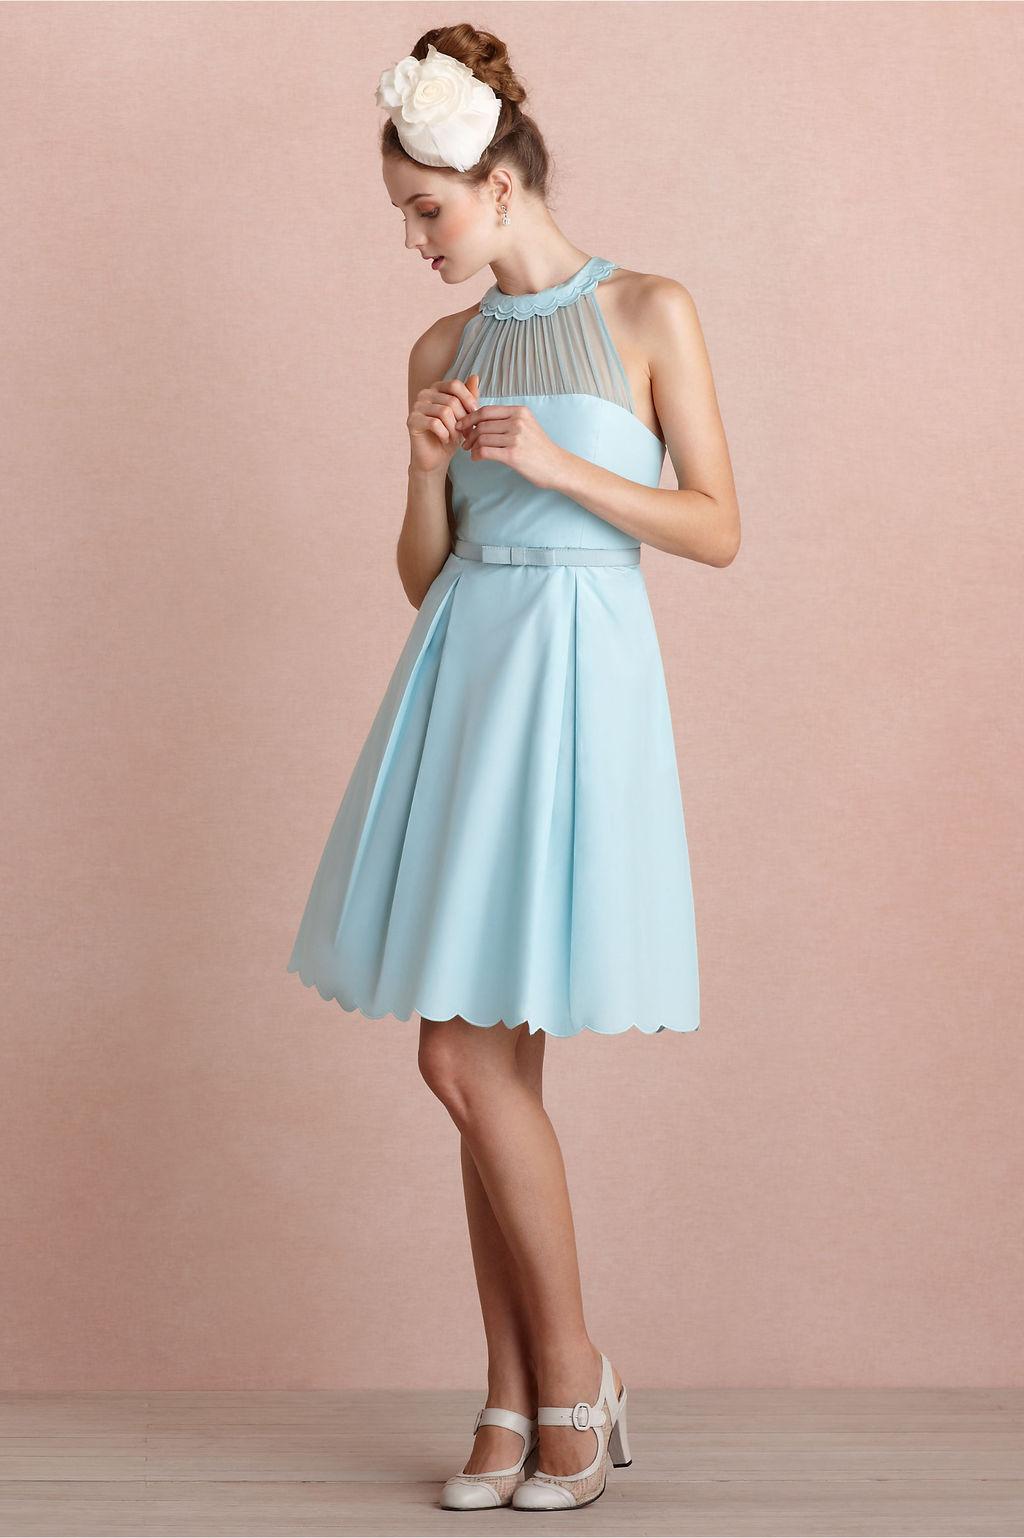 Sky-blue-bridesmaid-dress-with-illusion-neckline.full